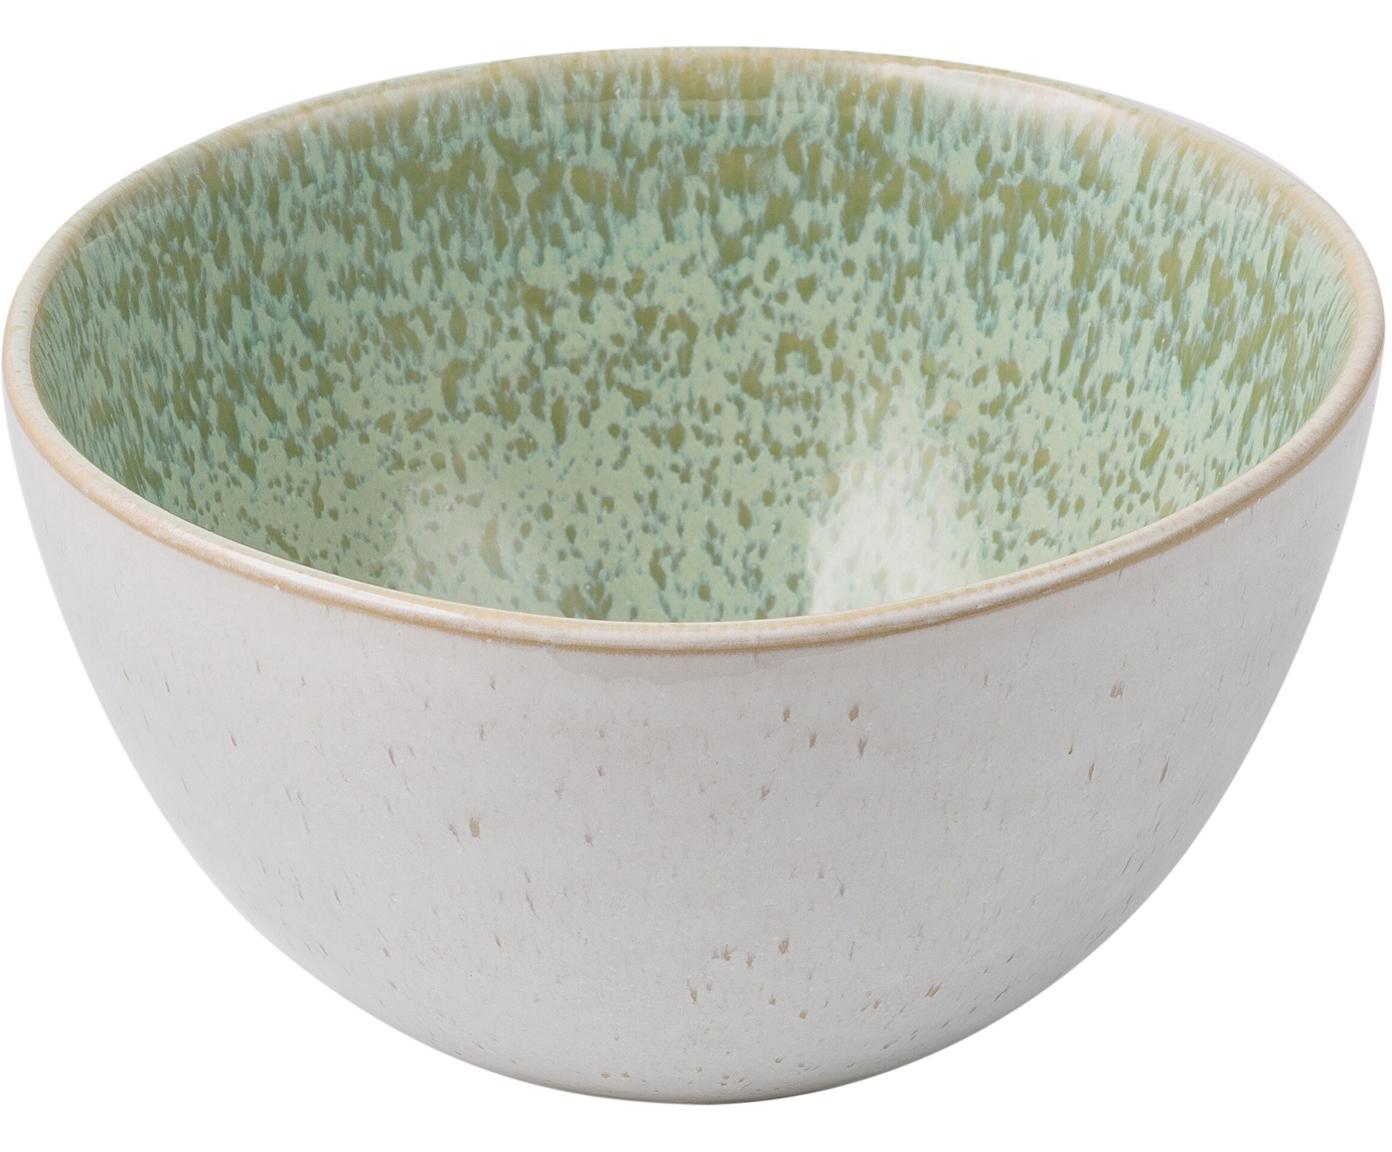 Ciotole dipinte a mano Areia, 2 pz., Gres, Menta, bianco latteo, beige, Ø 15 x A 8 cm